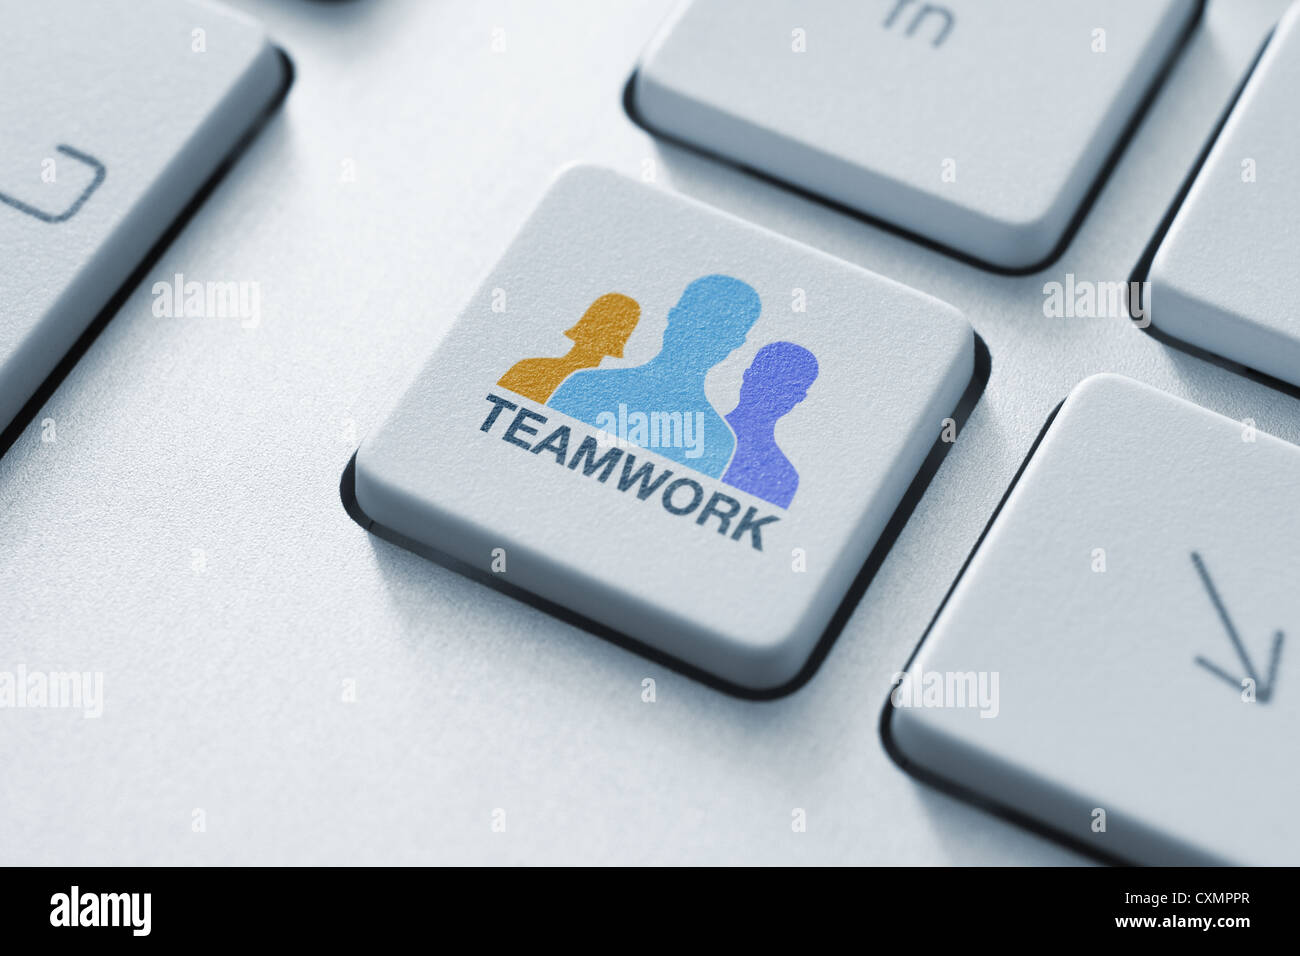 Teamwork key on keyboard concept. Toned image. - Stock Image